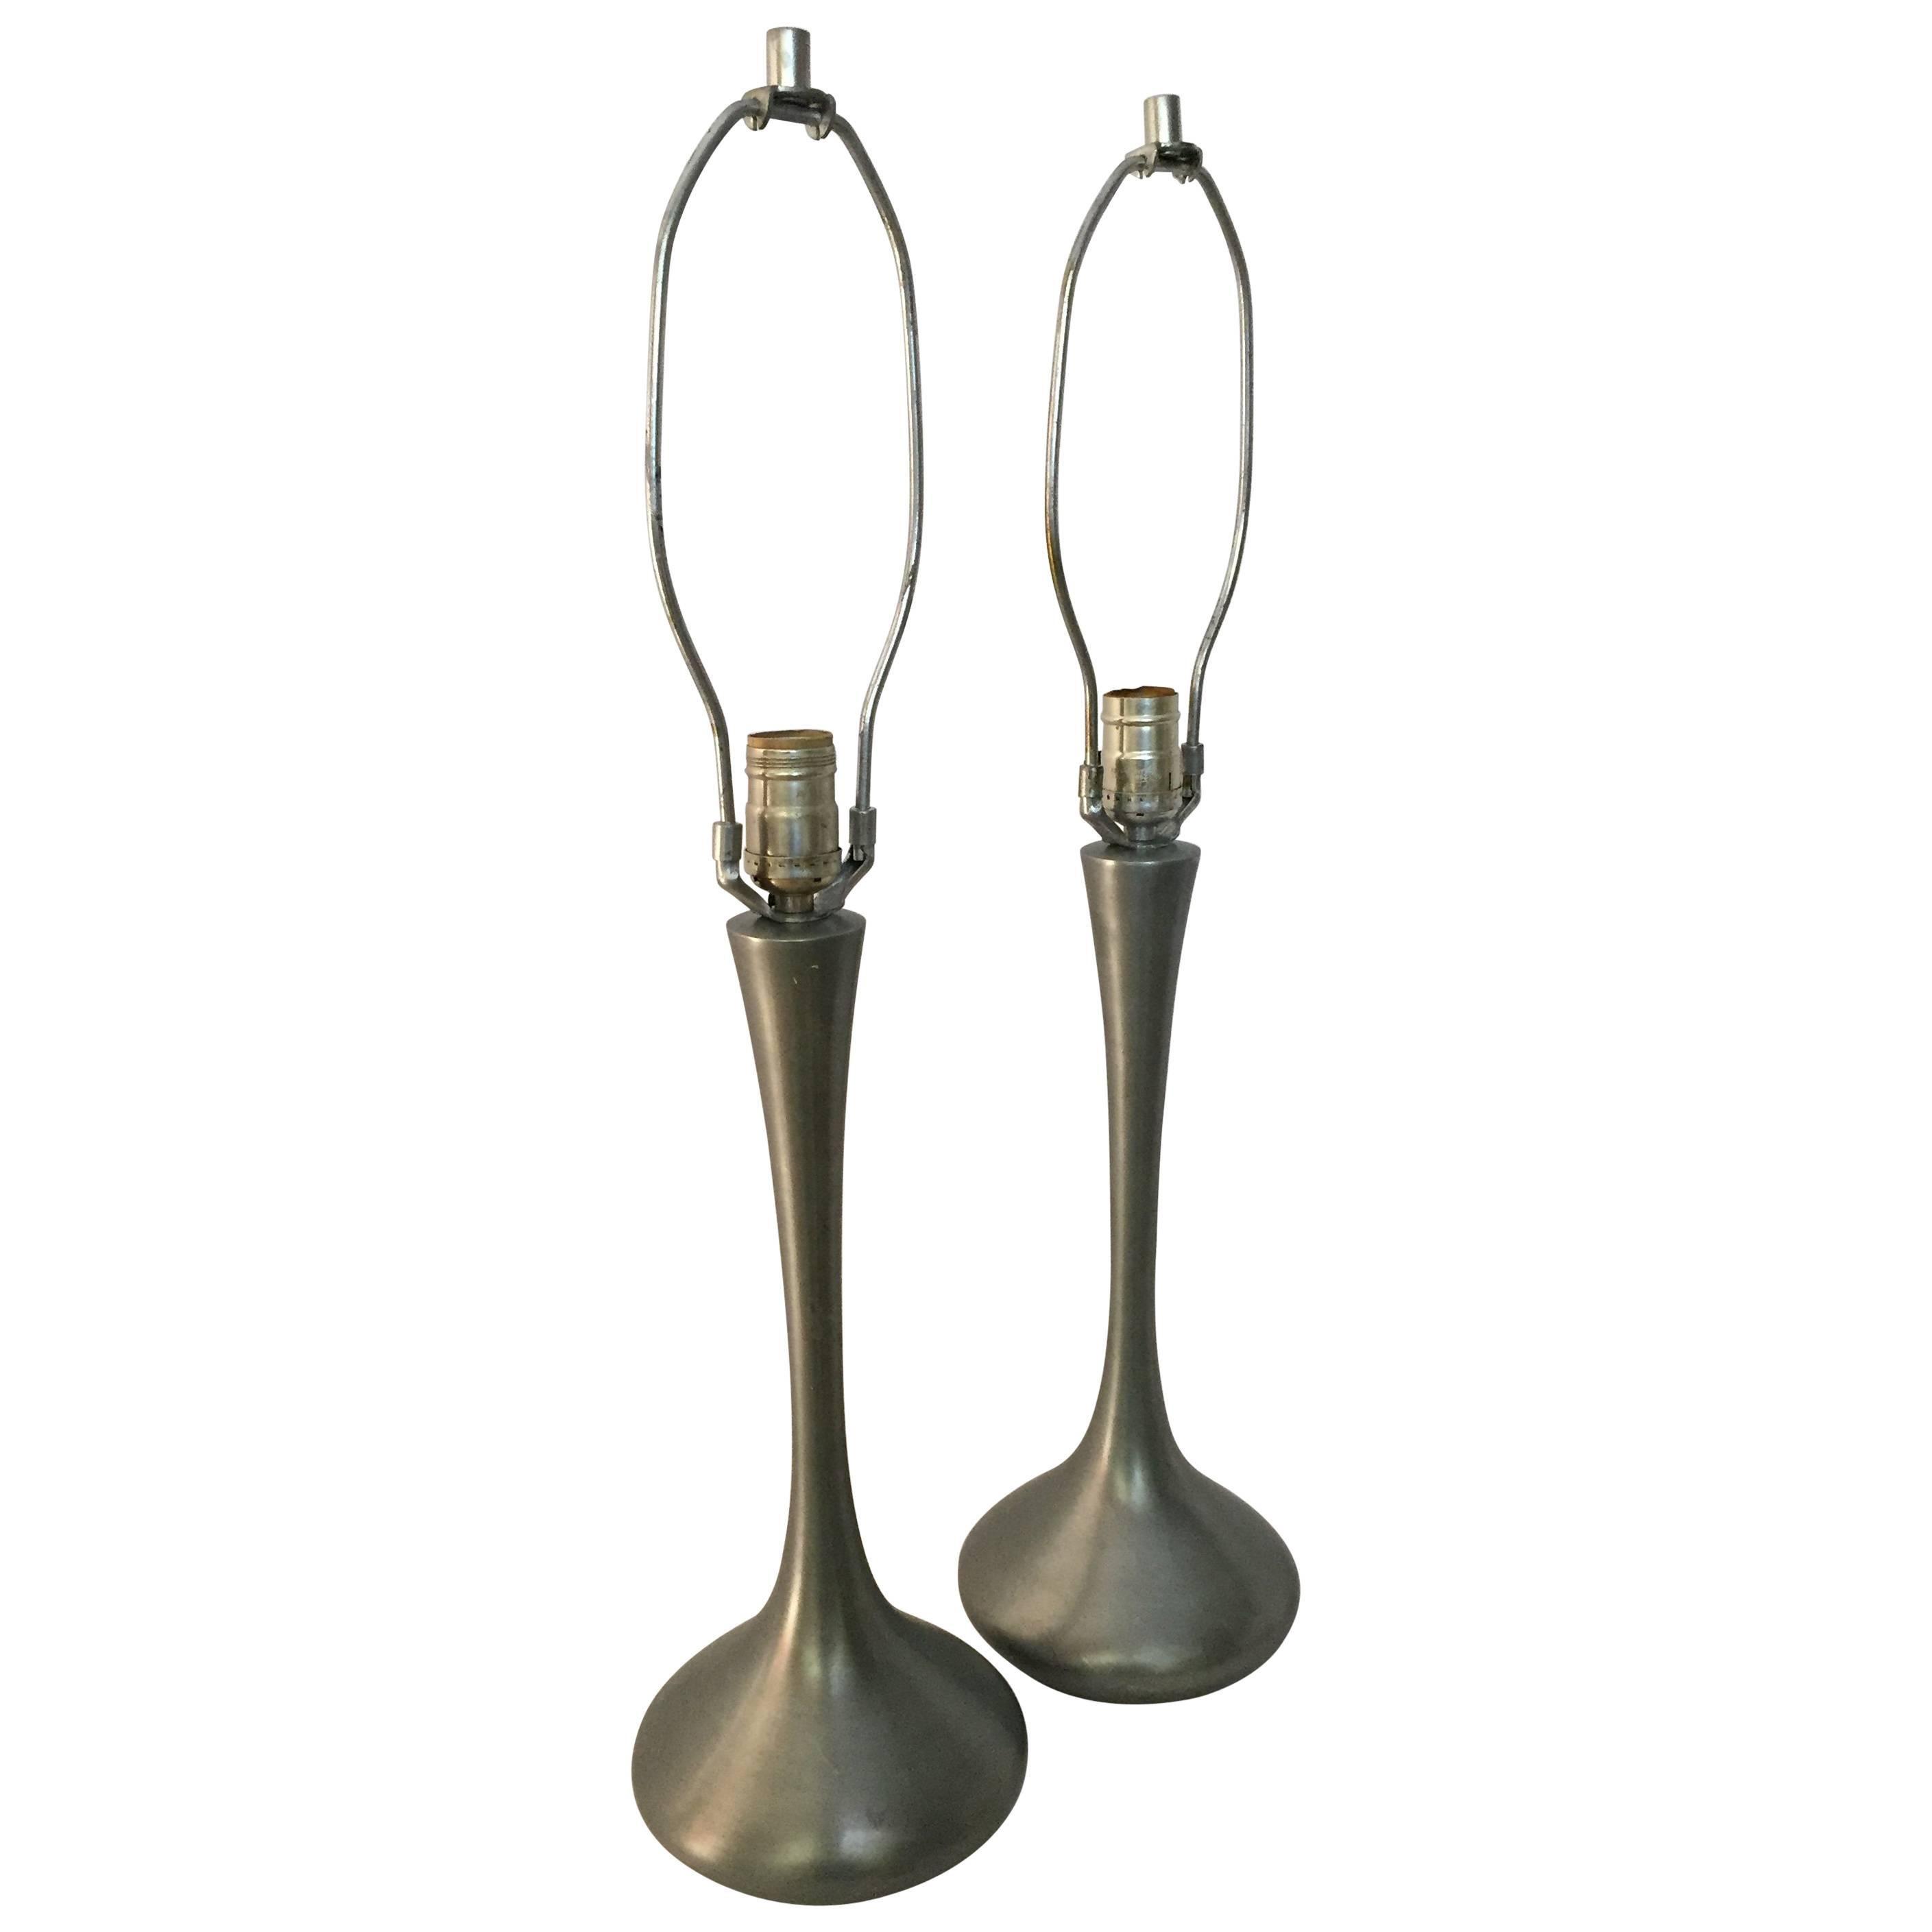 Pair of Laurel Tulip Lamps